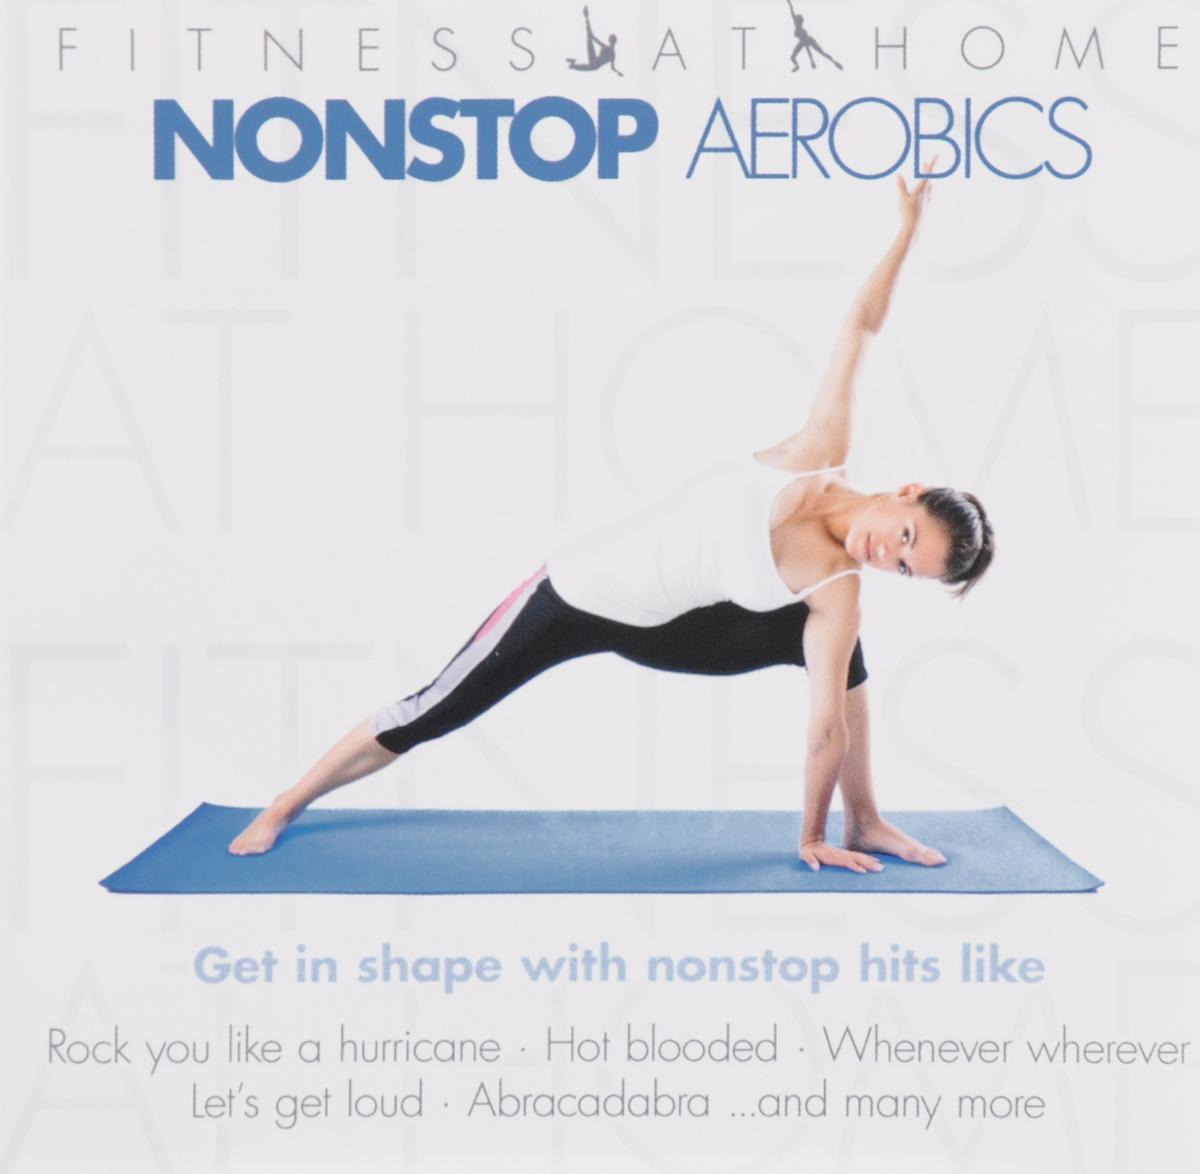 Fitness At Home. Nonstop Aerobics (2 CD)